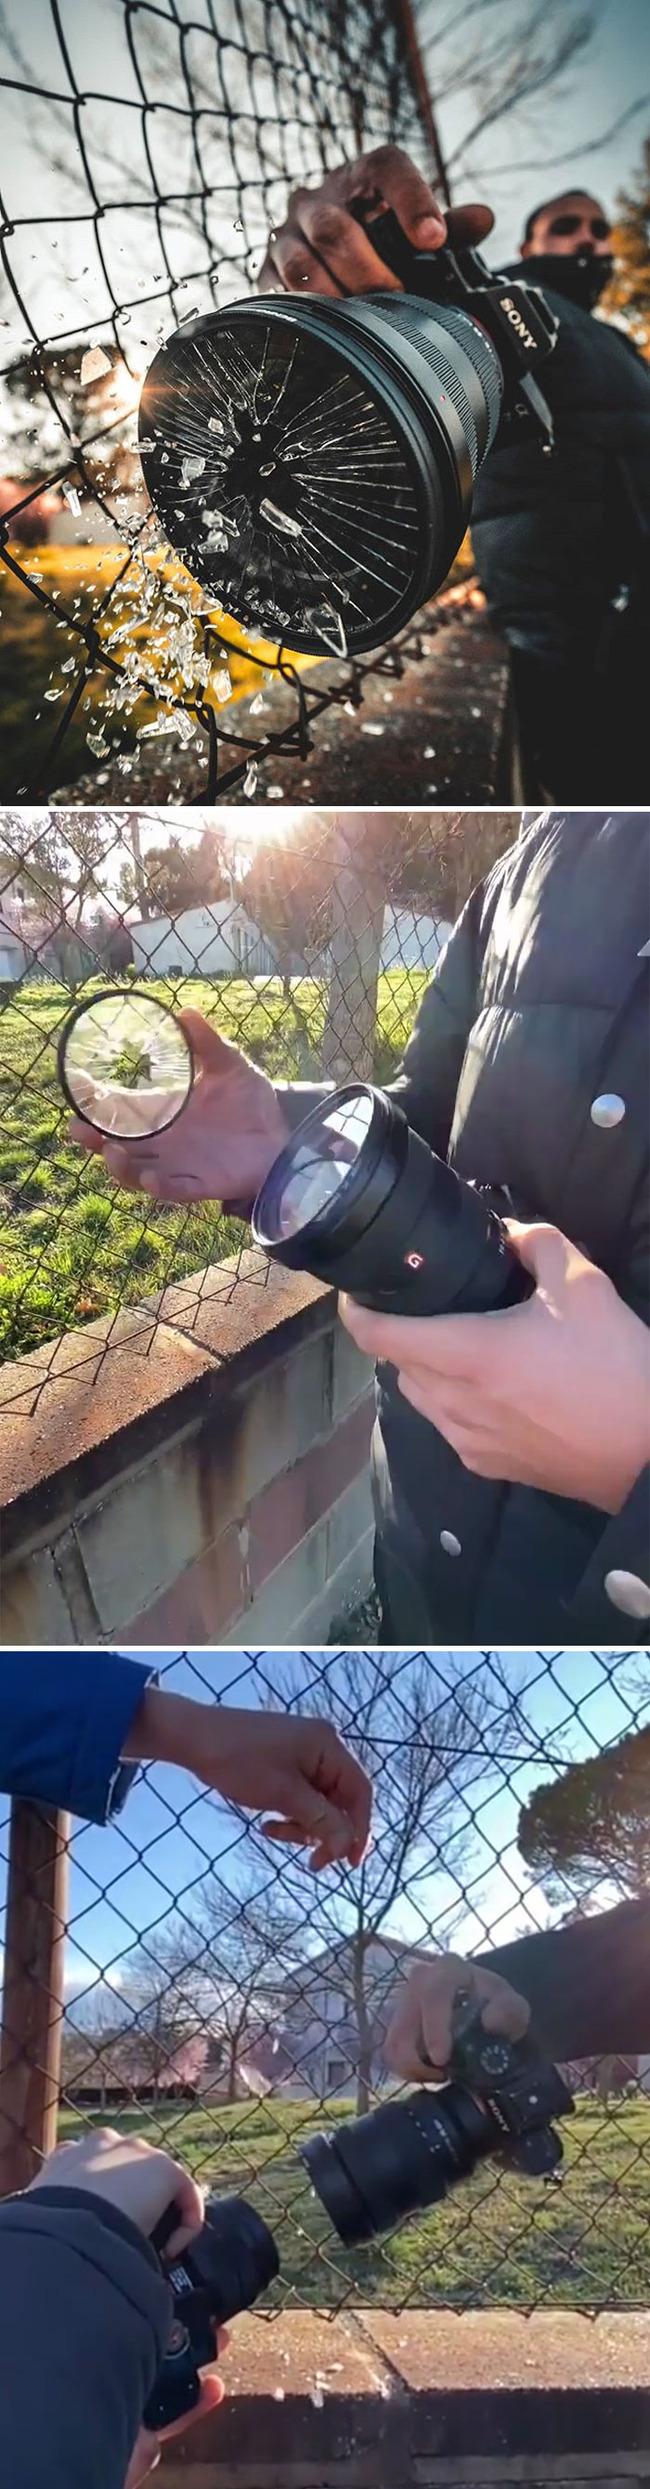 photography-tricks-jordi-koalitic-5f6b08d3df949__700